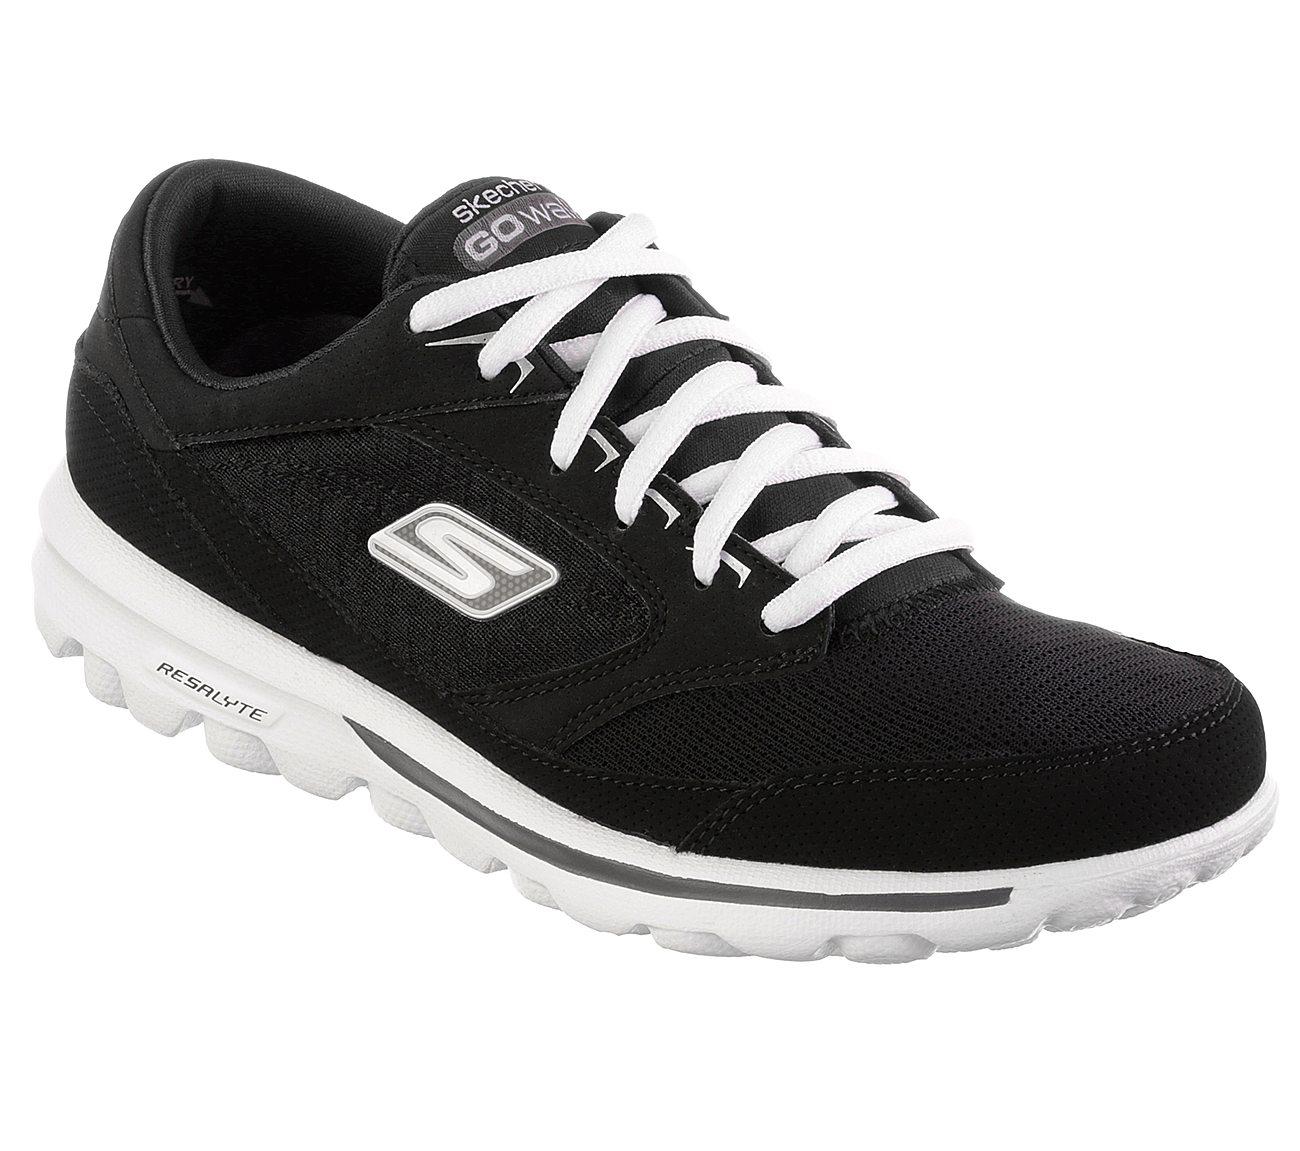 skechers resalyte shoes